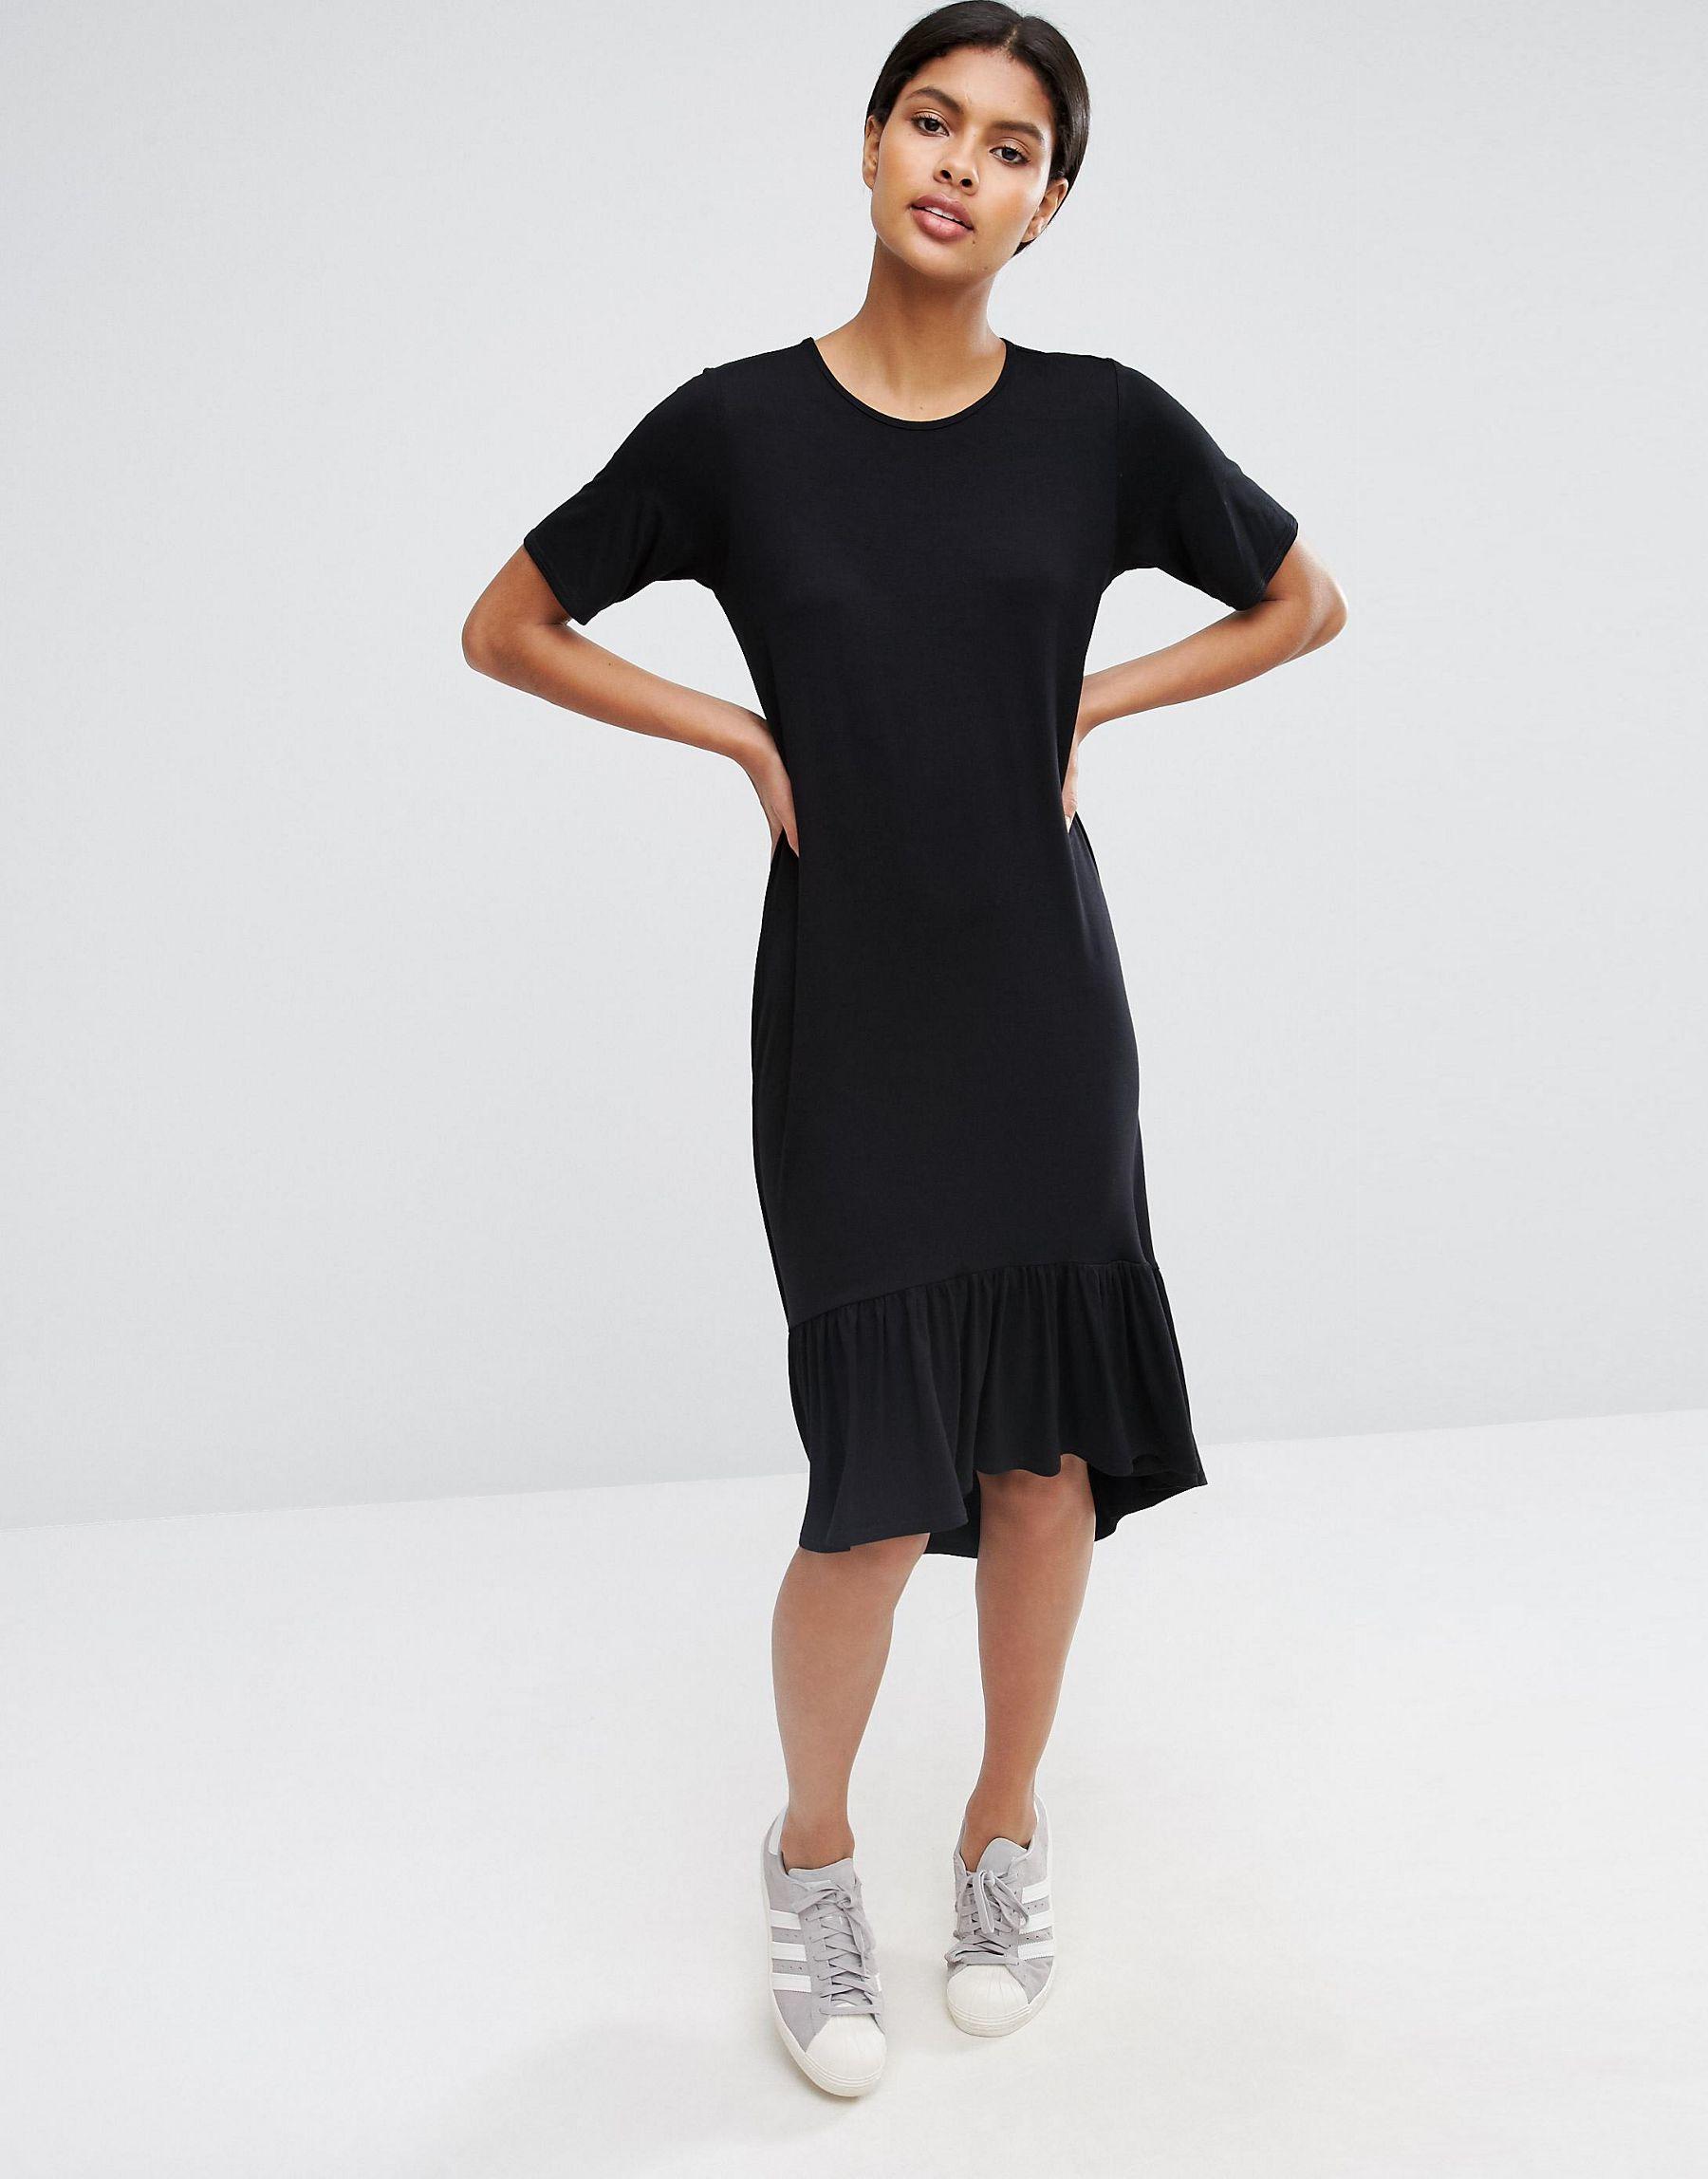 Asos frill hem midi t shirt dress in black lyst for Midi shirt dress black